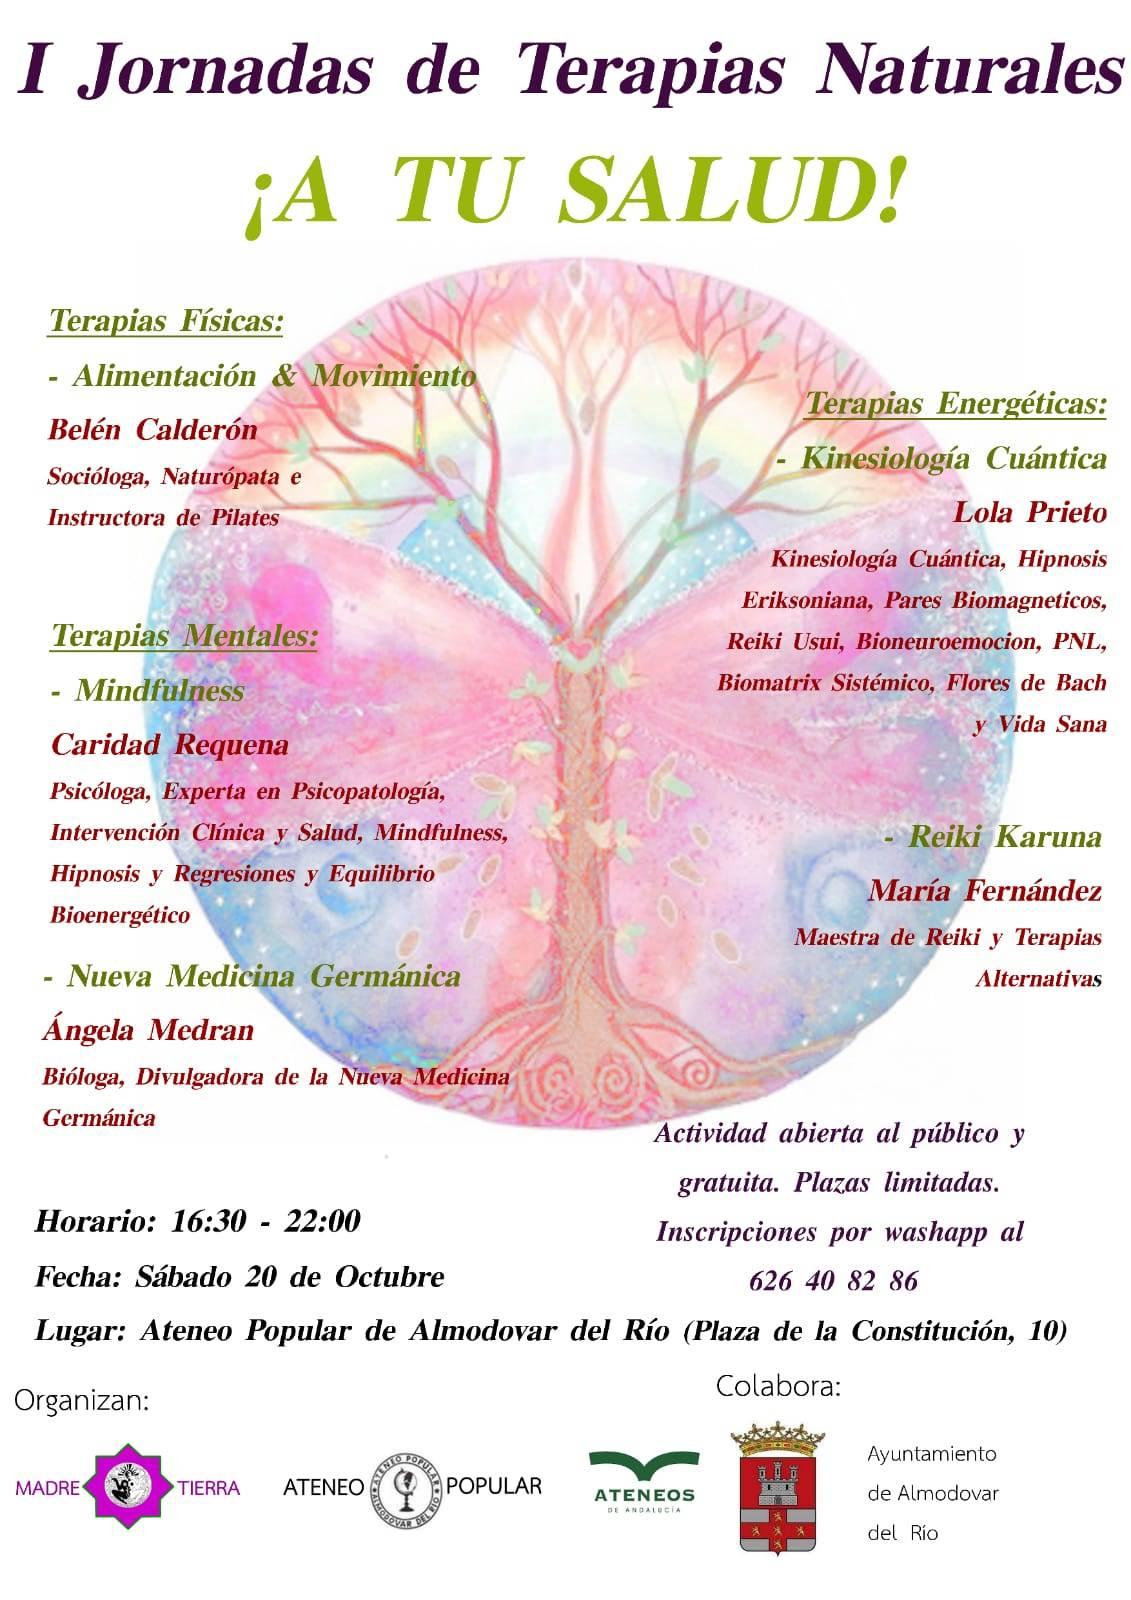 I Jornadas de Terapias Naturales